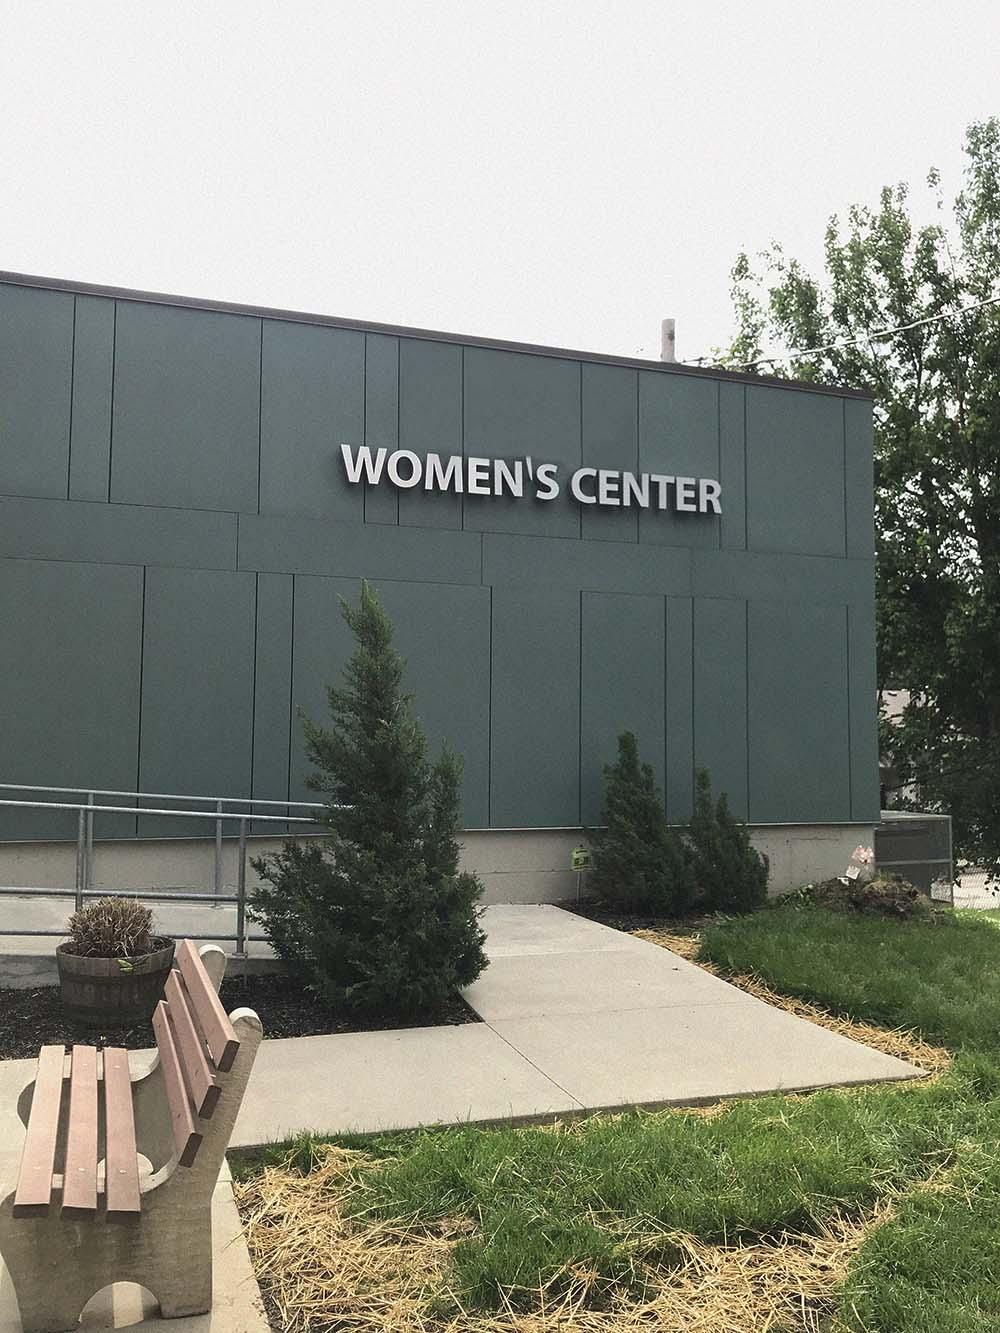 Women's Center sign on building